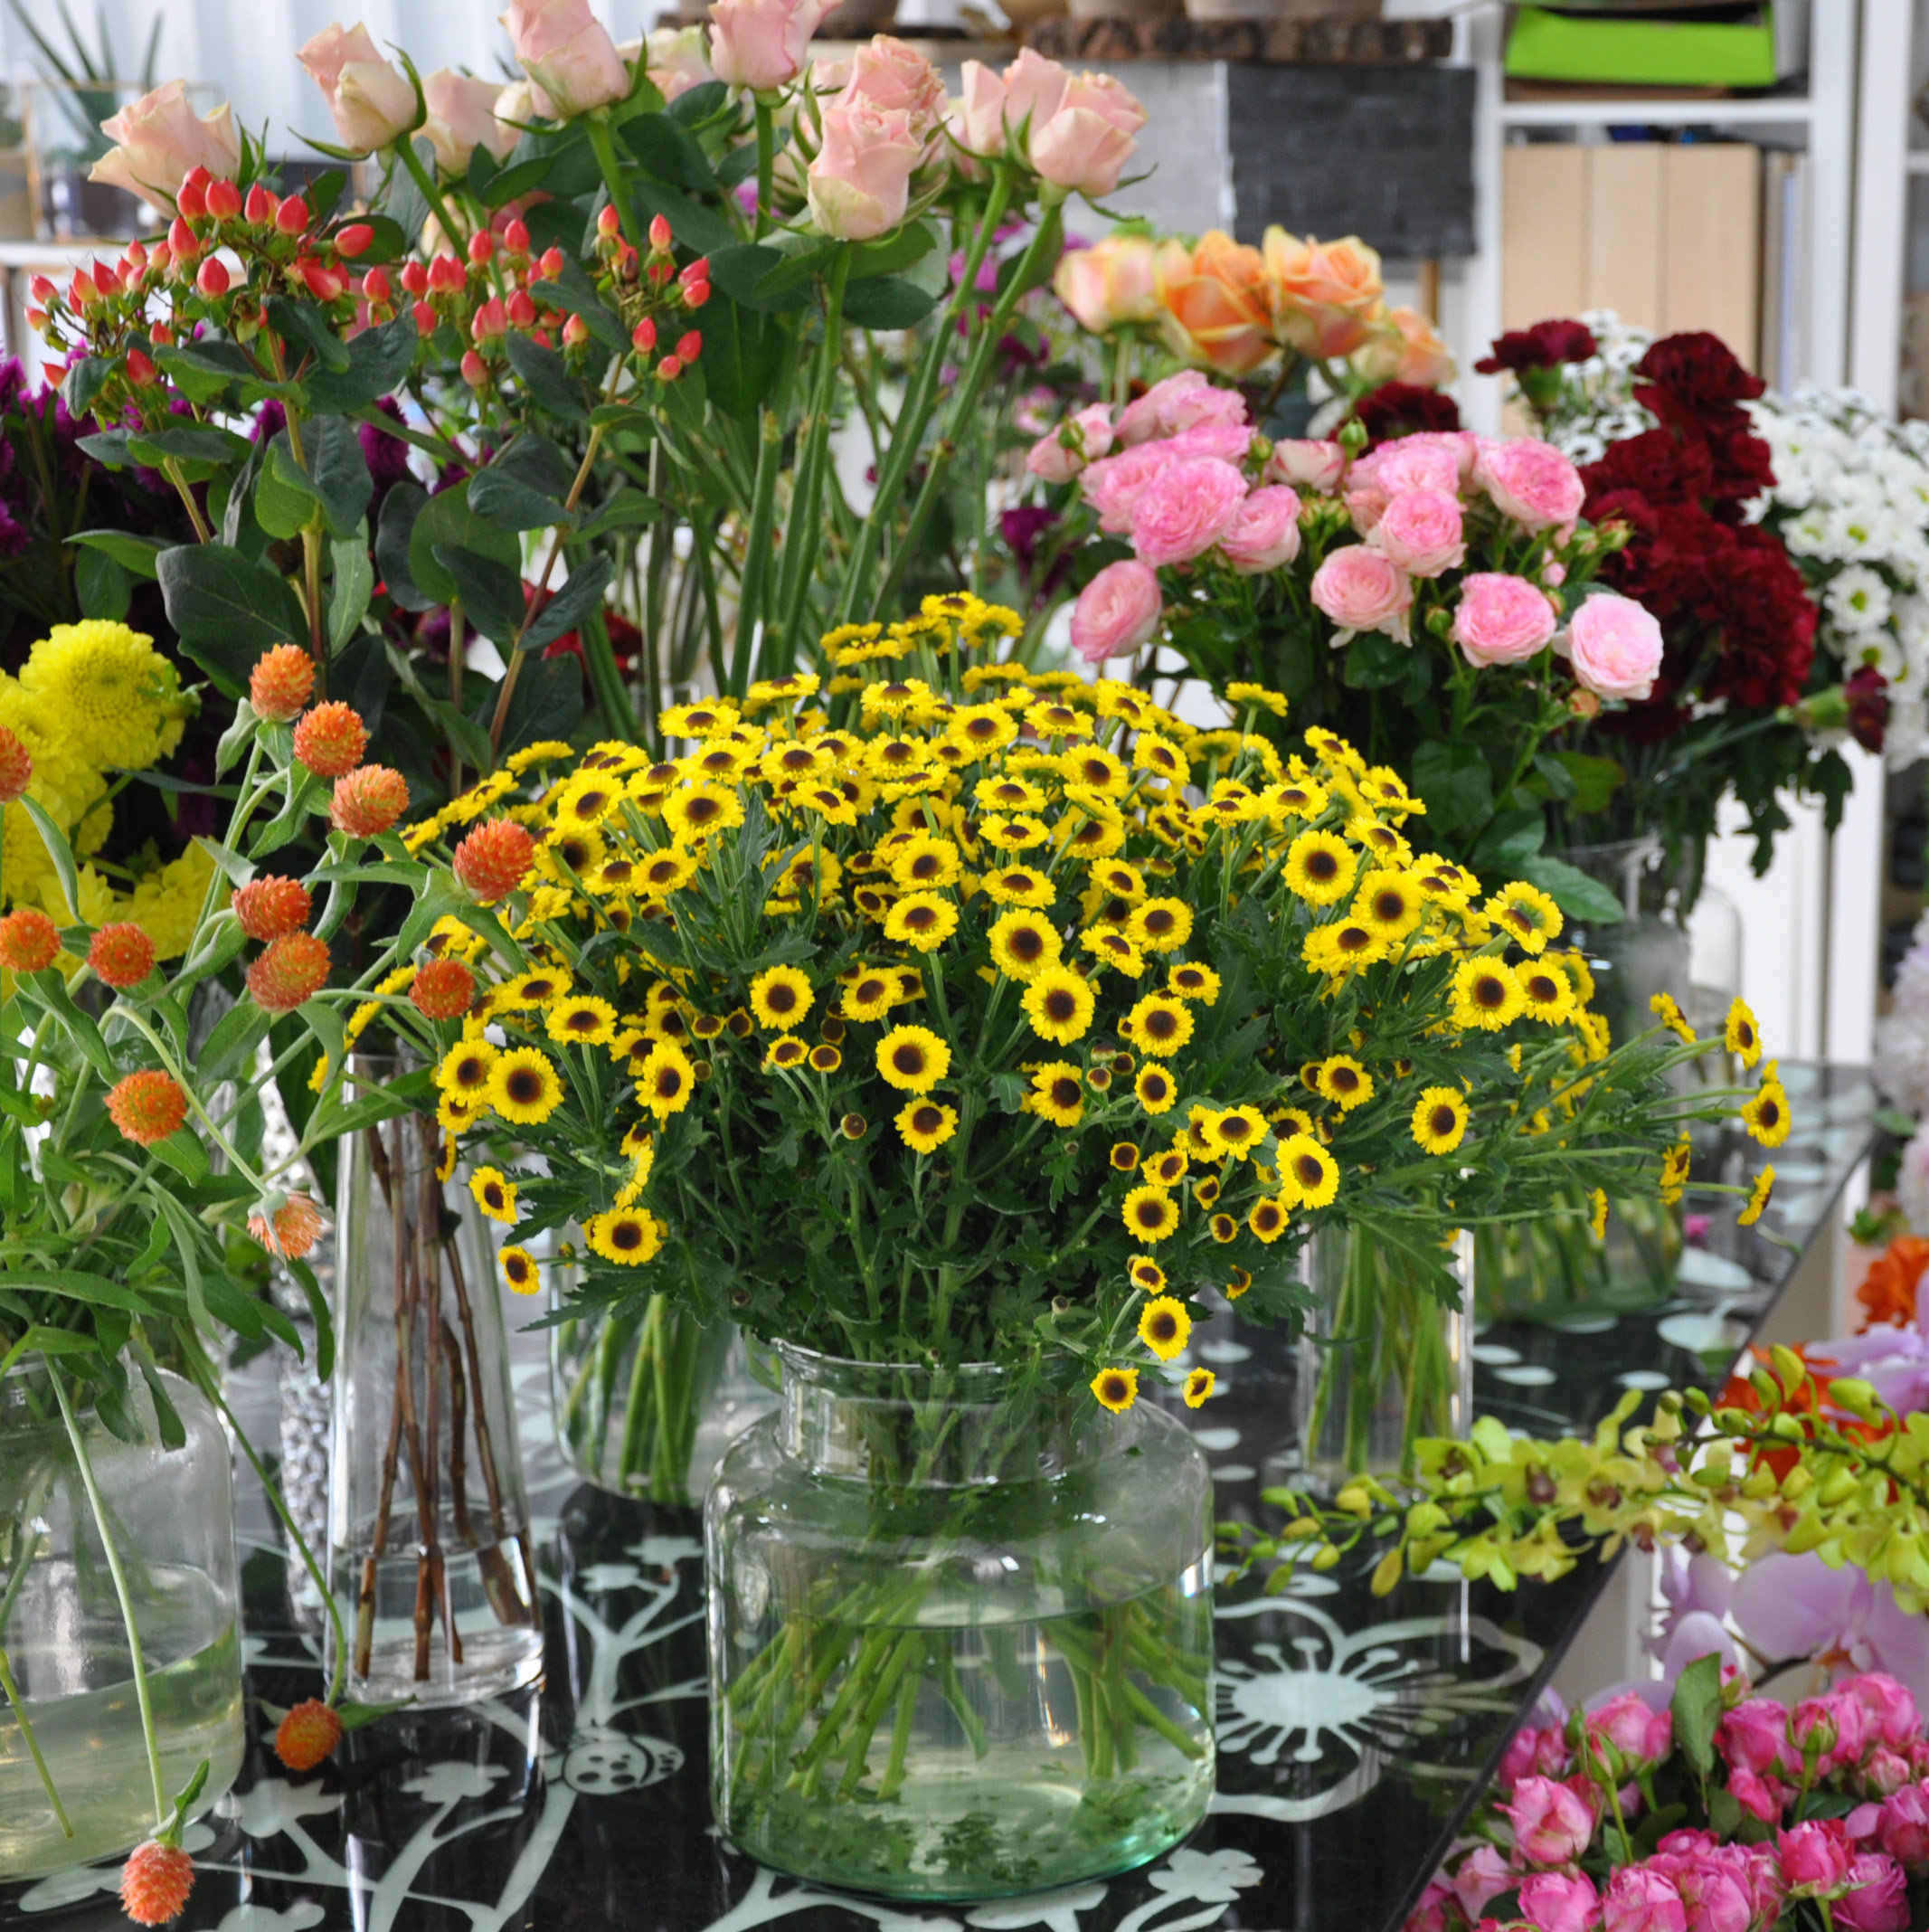 florist display table of fresh flowers